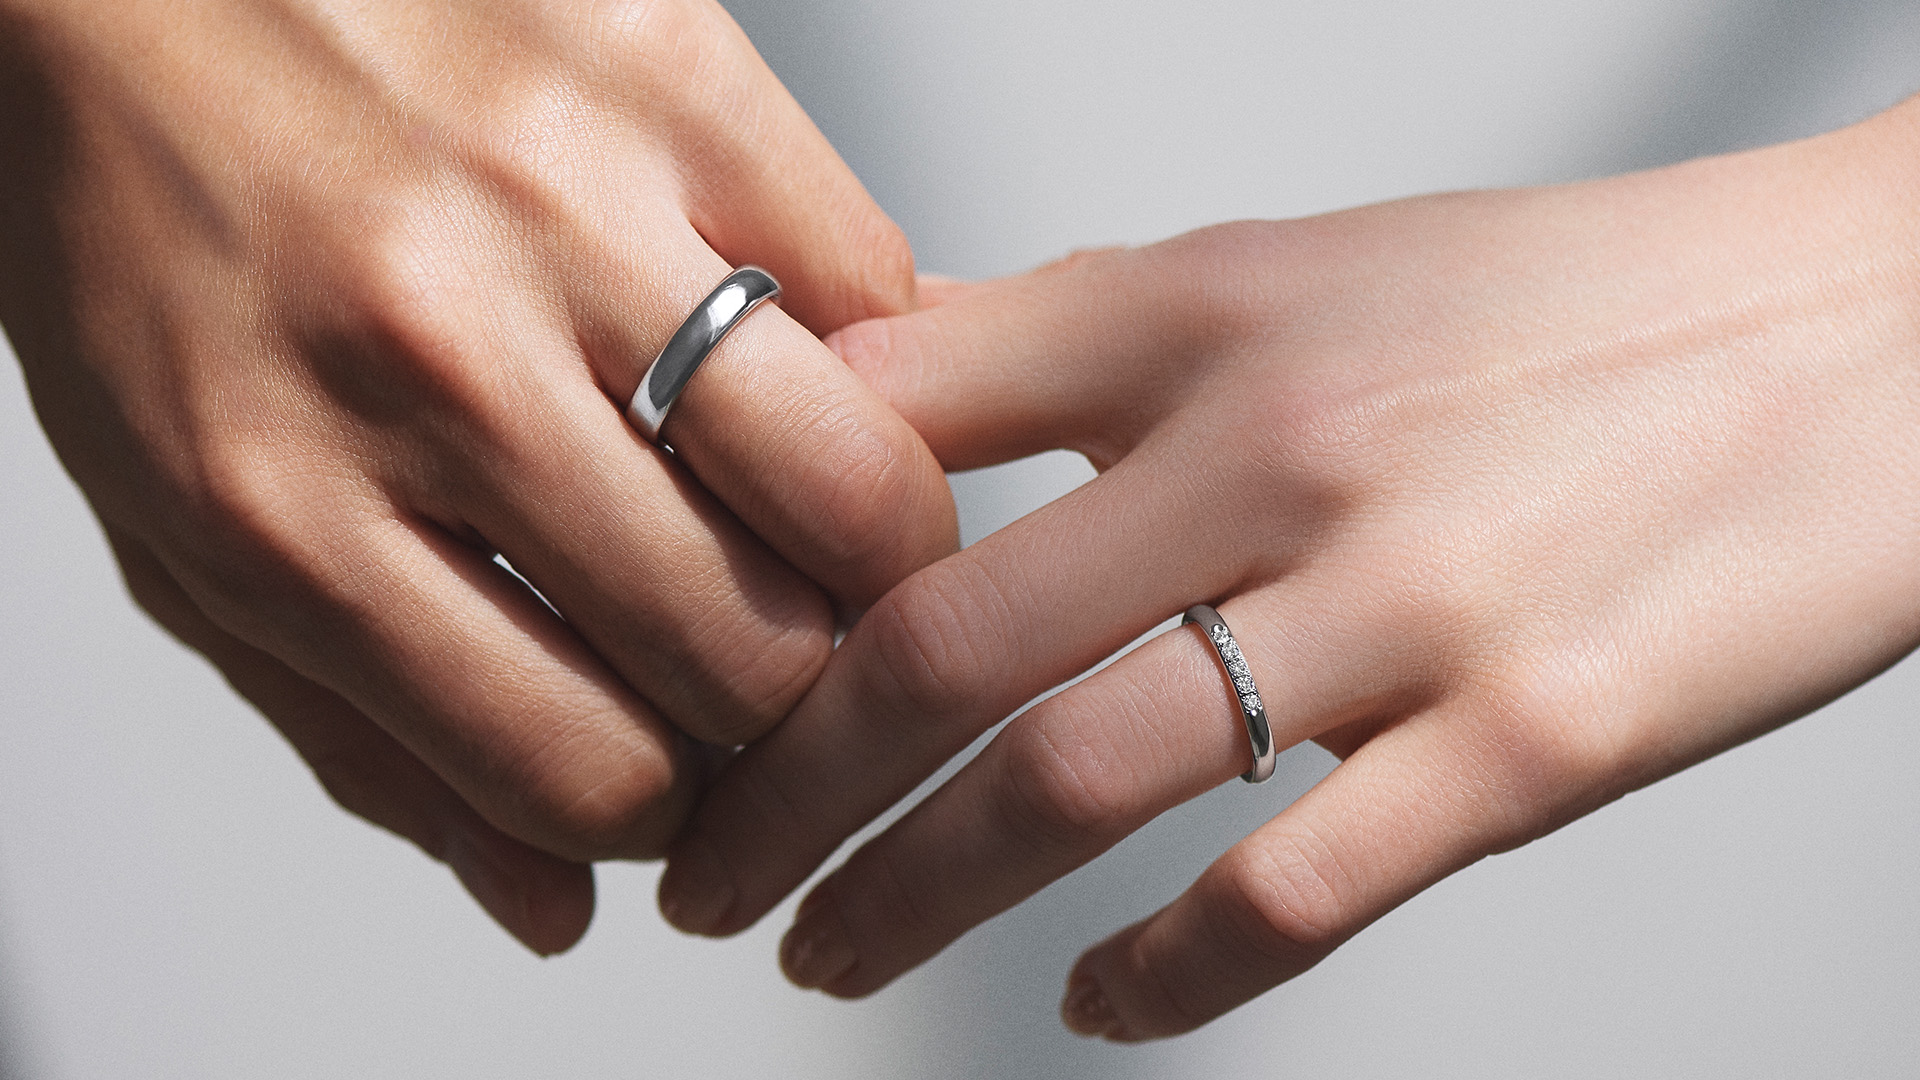 Origin Belief03 オリジンビリーフ03 | 結婚指輪サムネイル 4